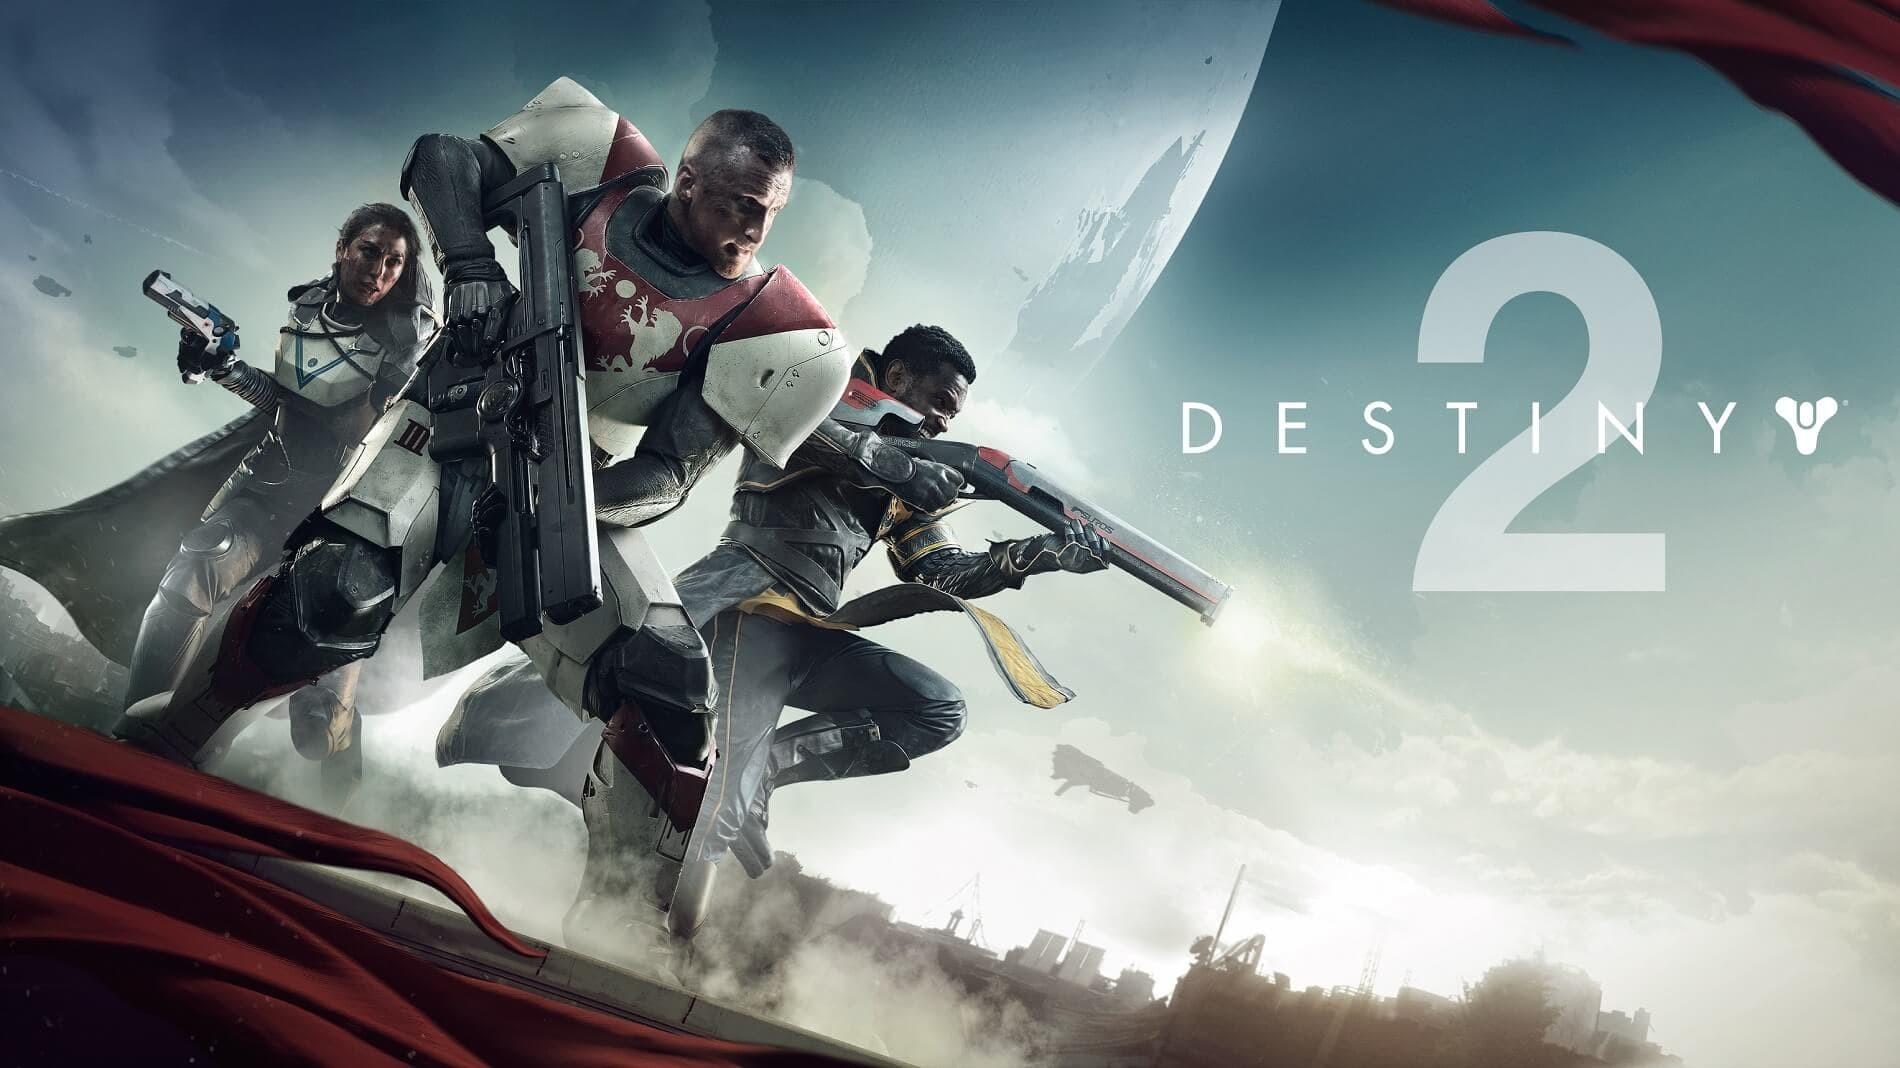 Destiny 2 cover art con logo